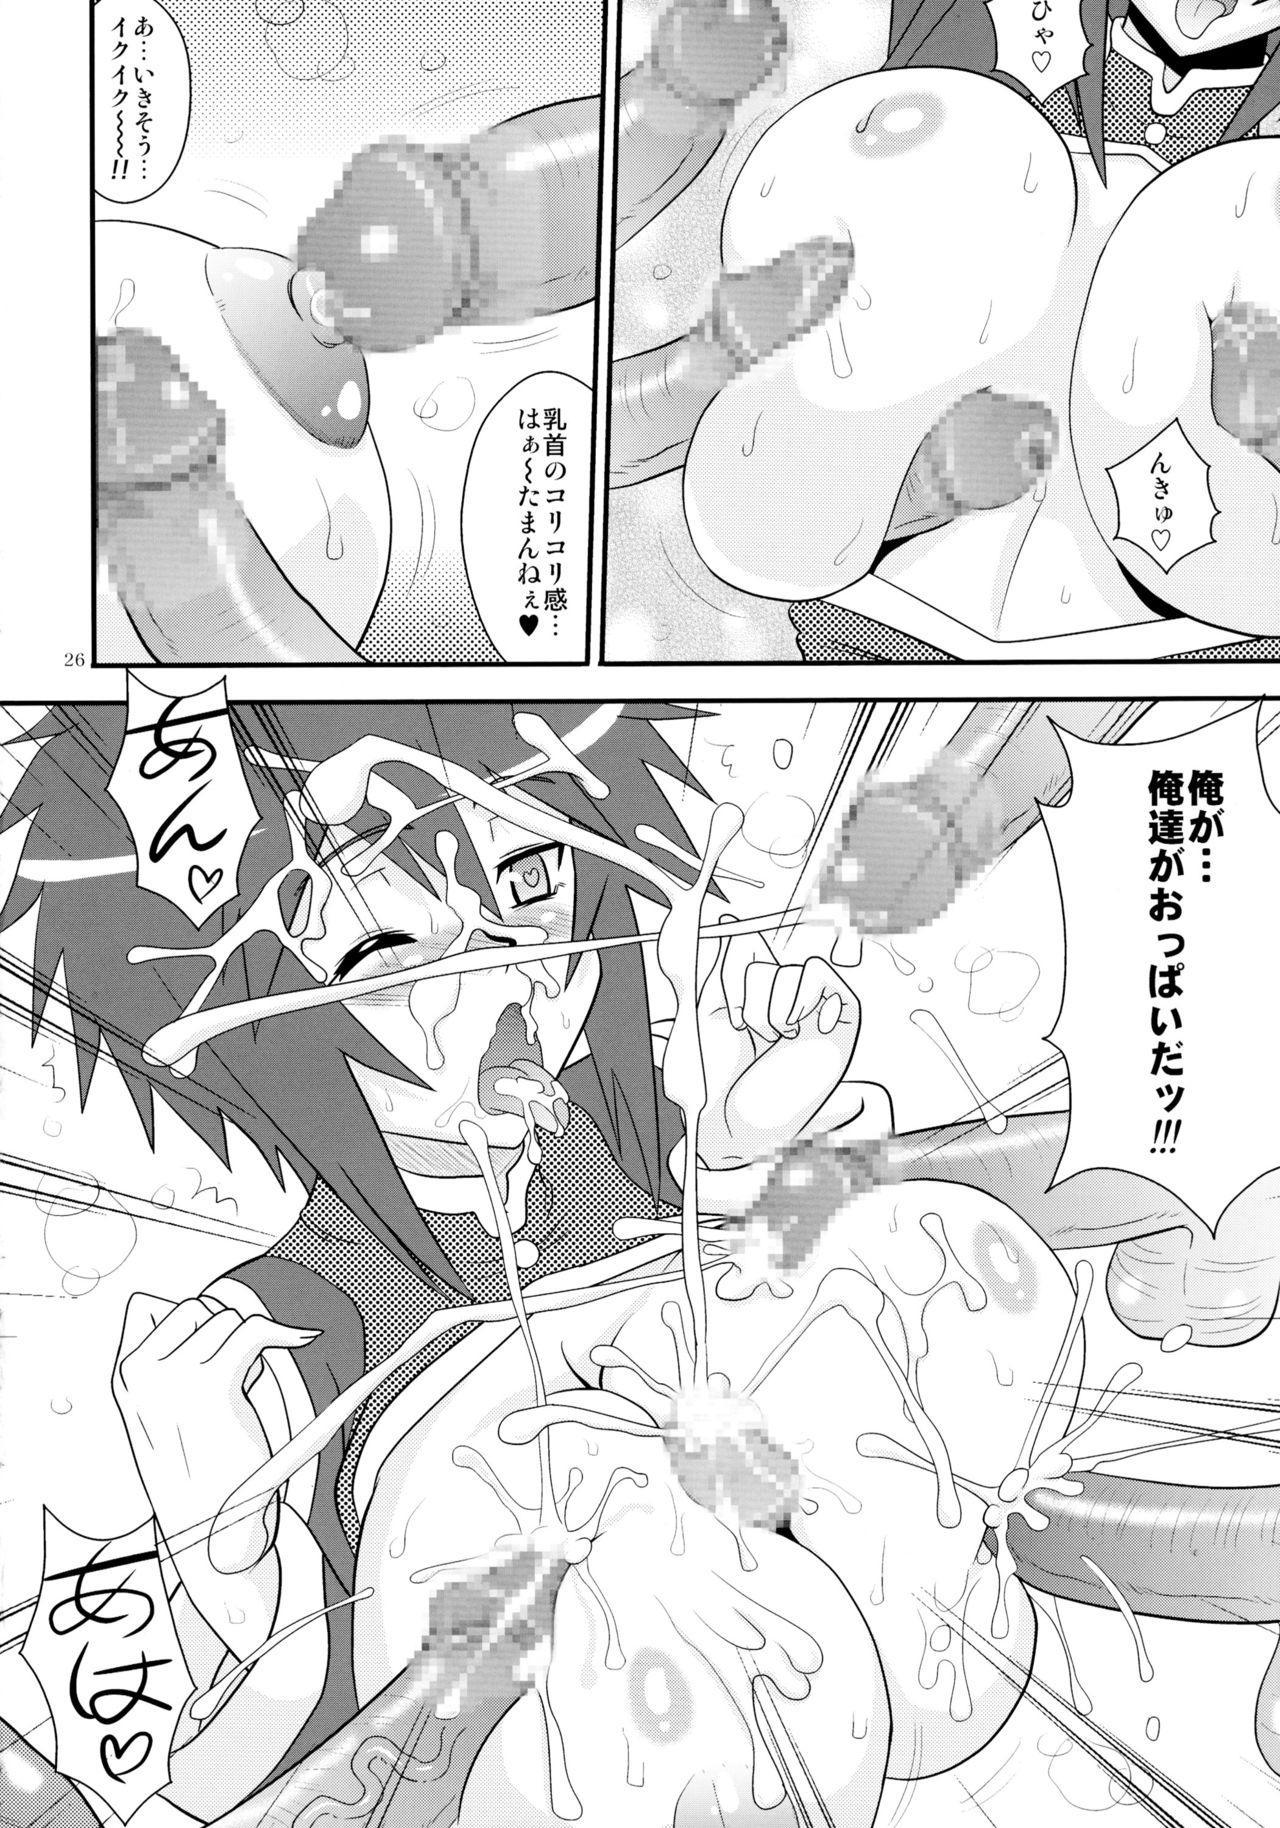 Oshiete Try-san 25